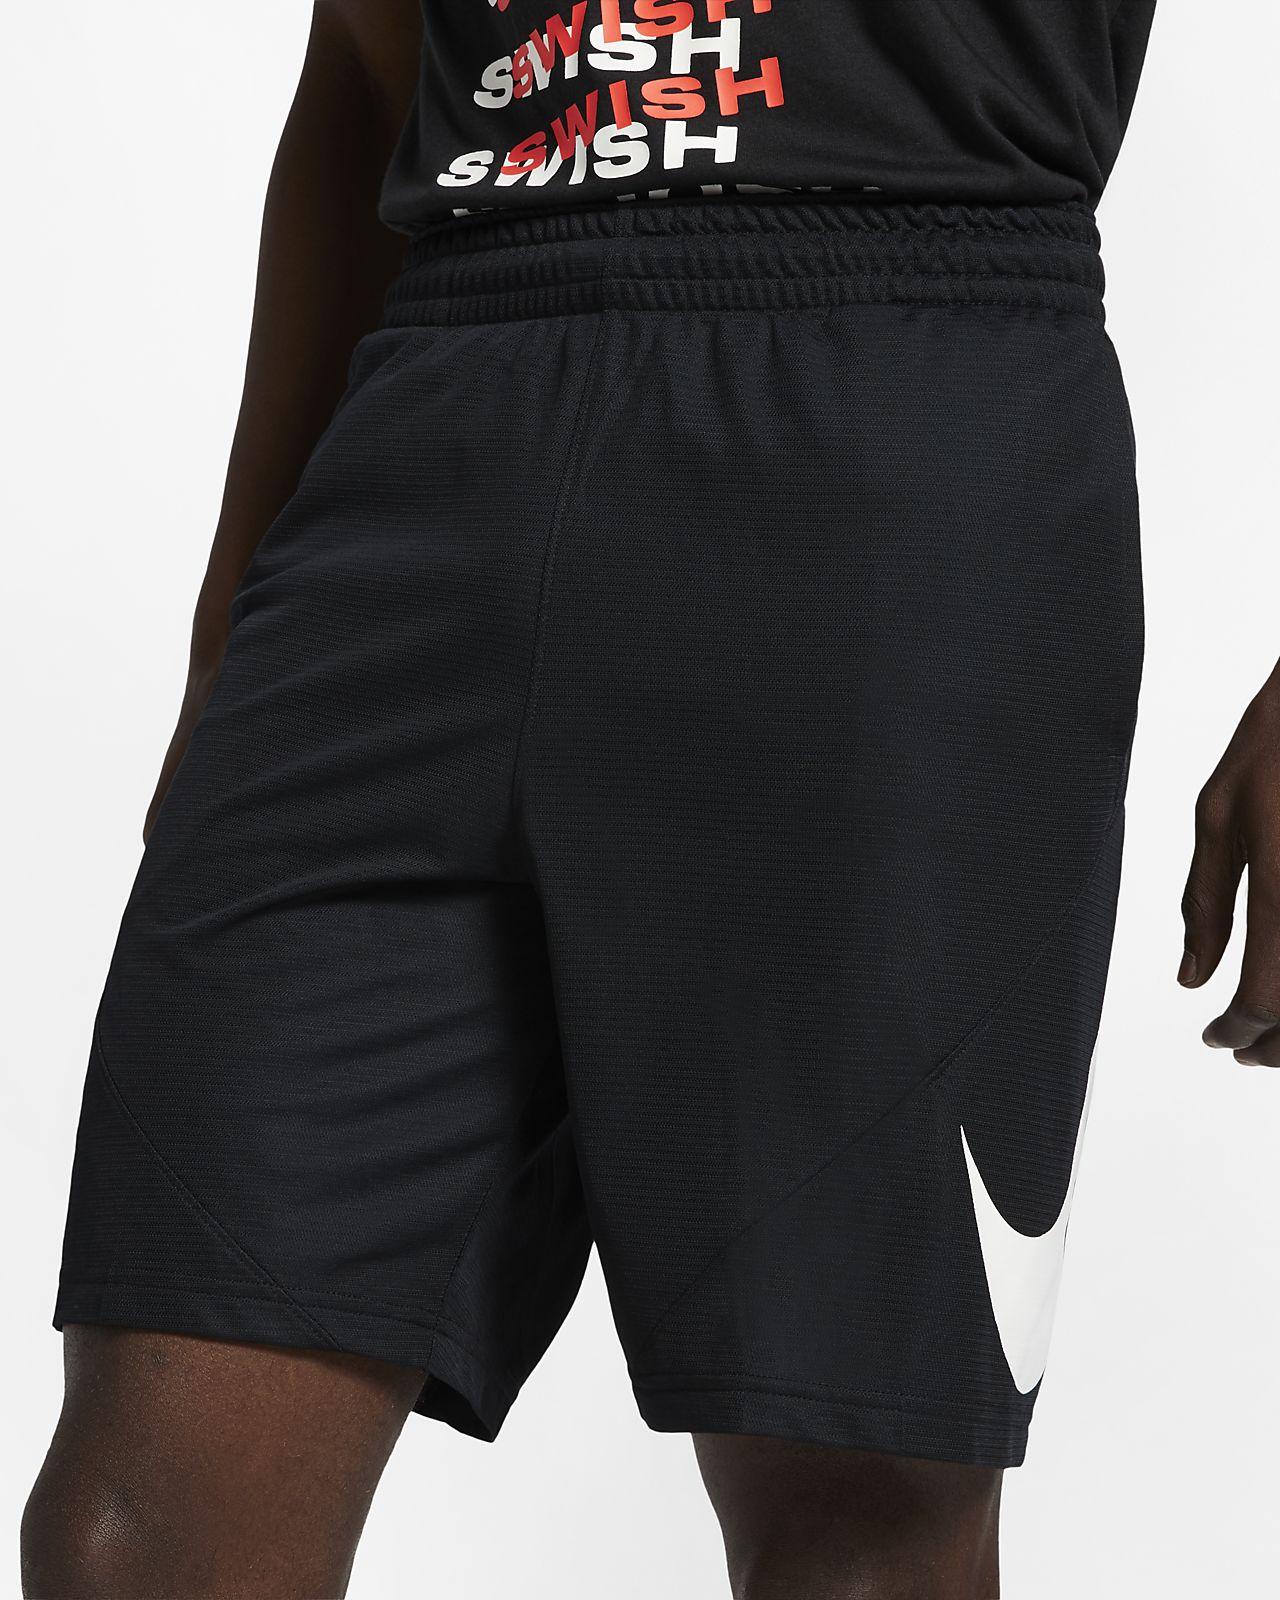 23 Basketball Short De Cm Nike Homme Pour H2IWD9E